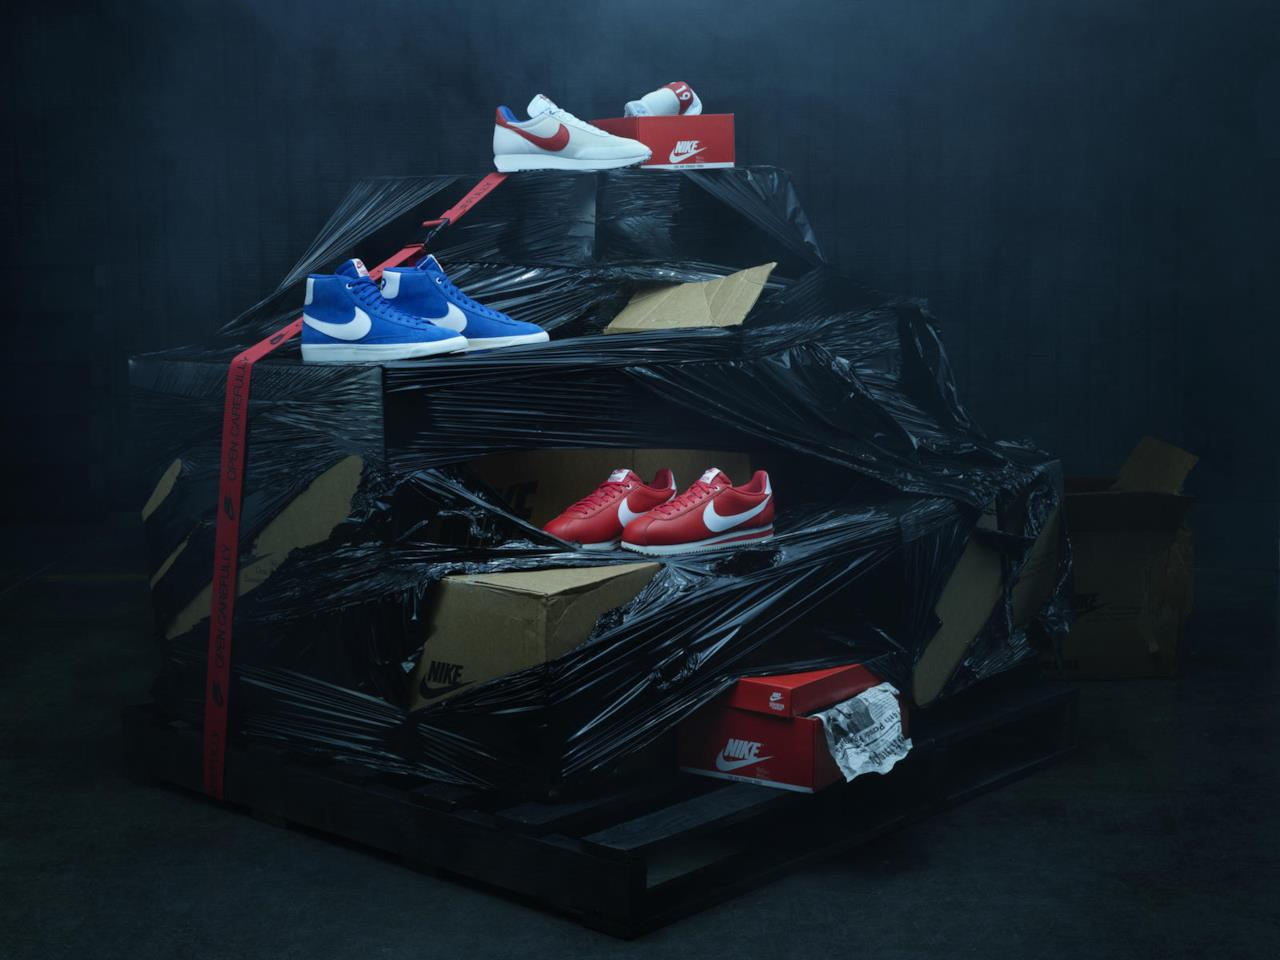 Le scarpe Nike a tema Stranger Things